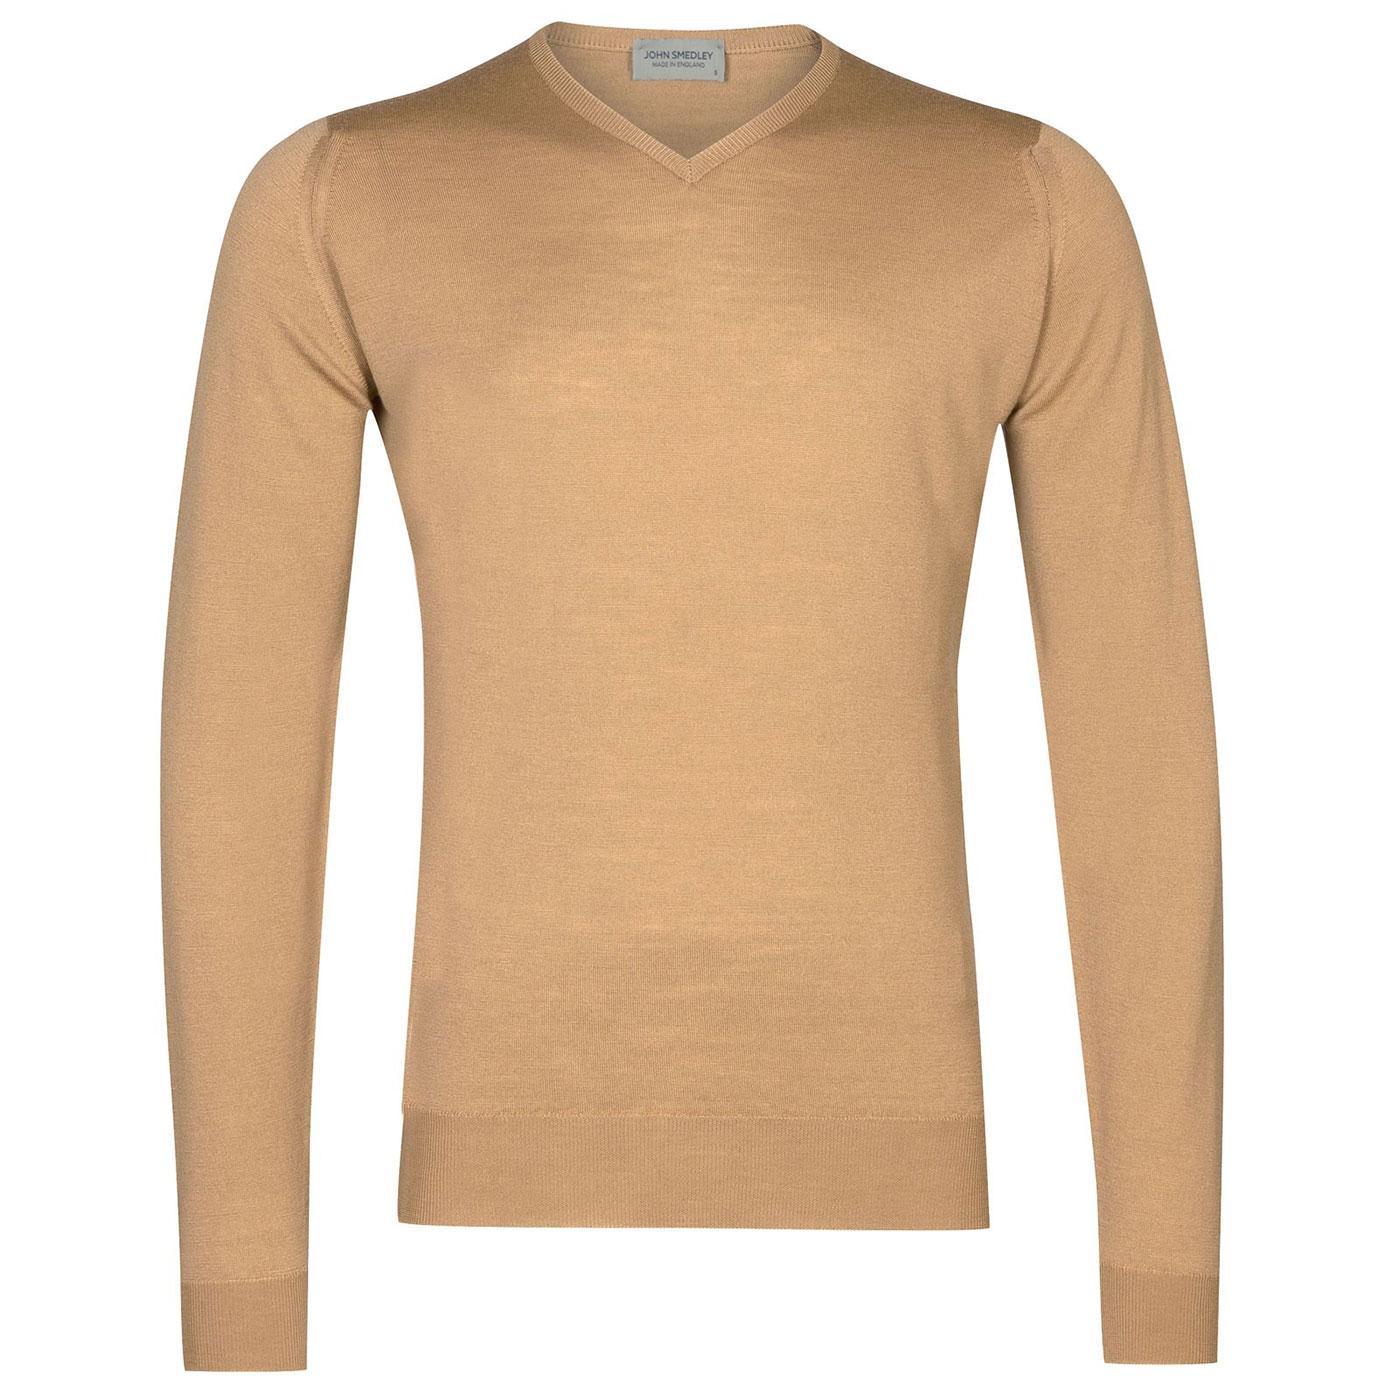 Shipton JOHN SMEDLEY Merino Wool V-Neck Pullover